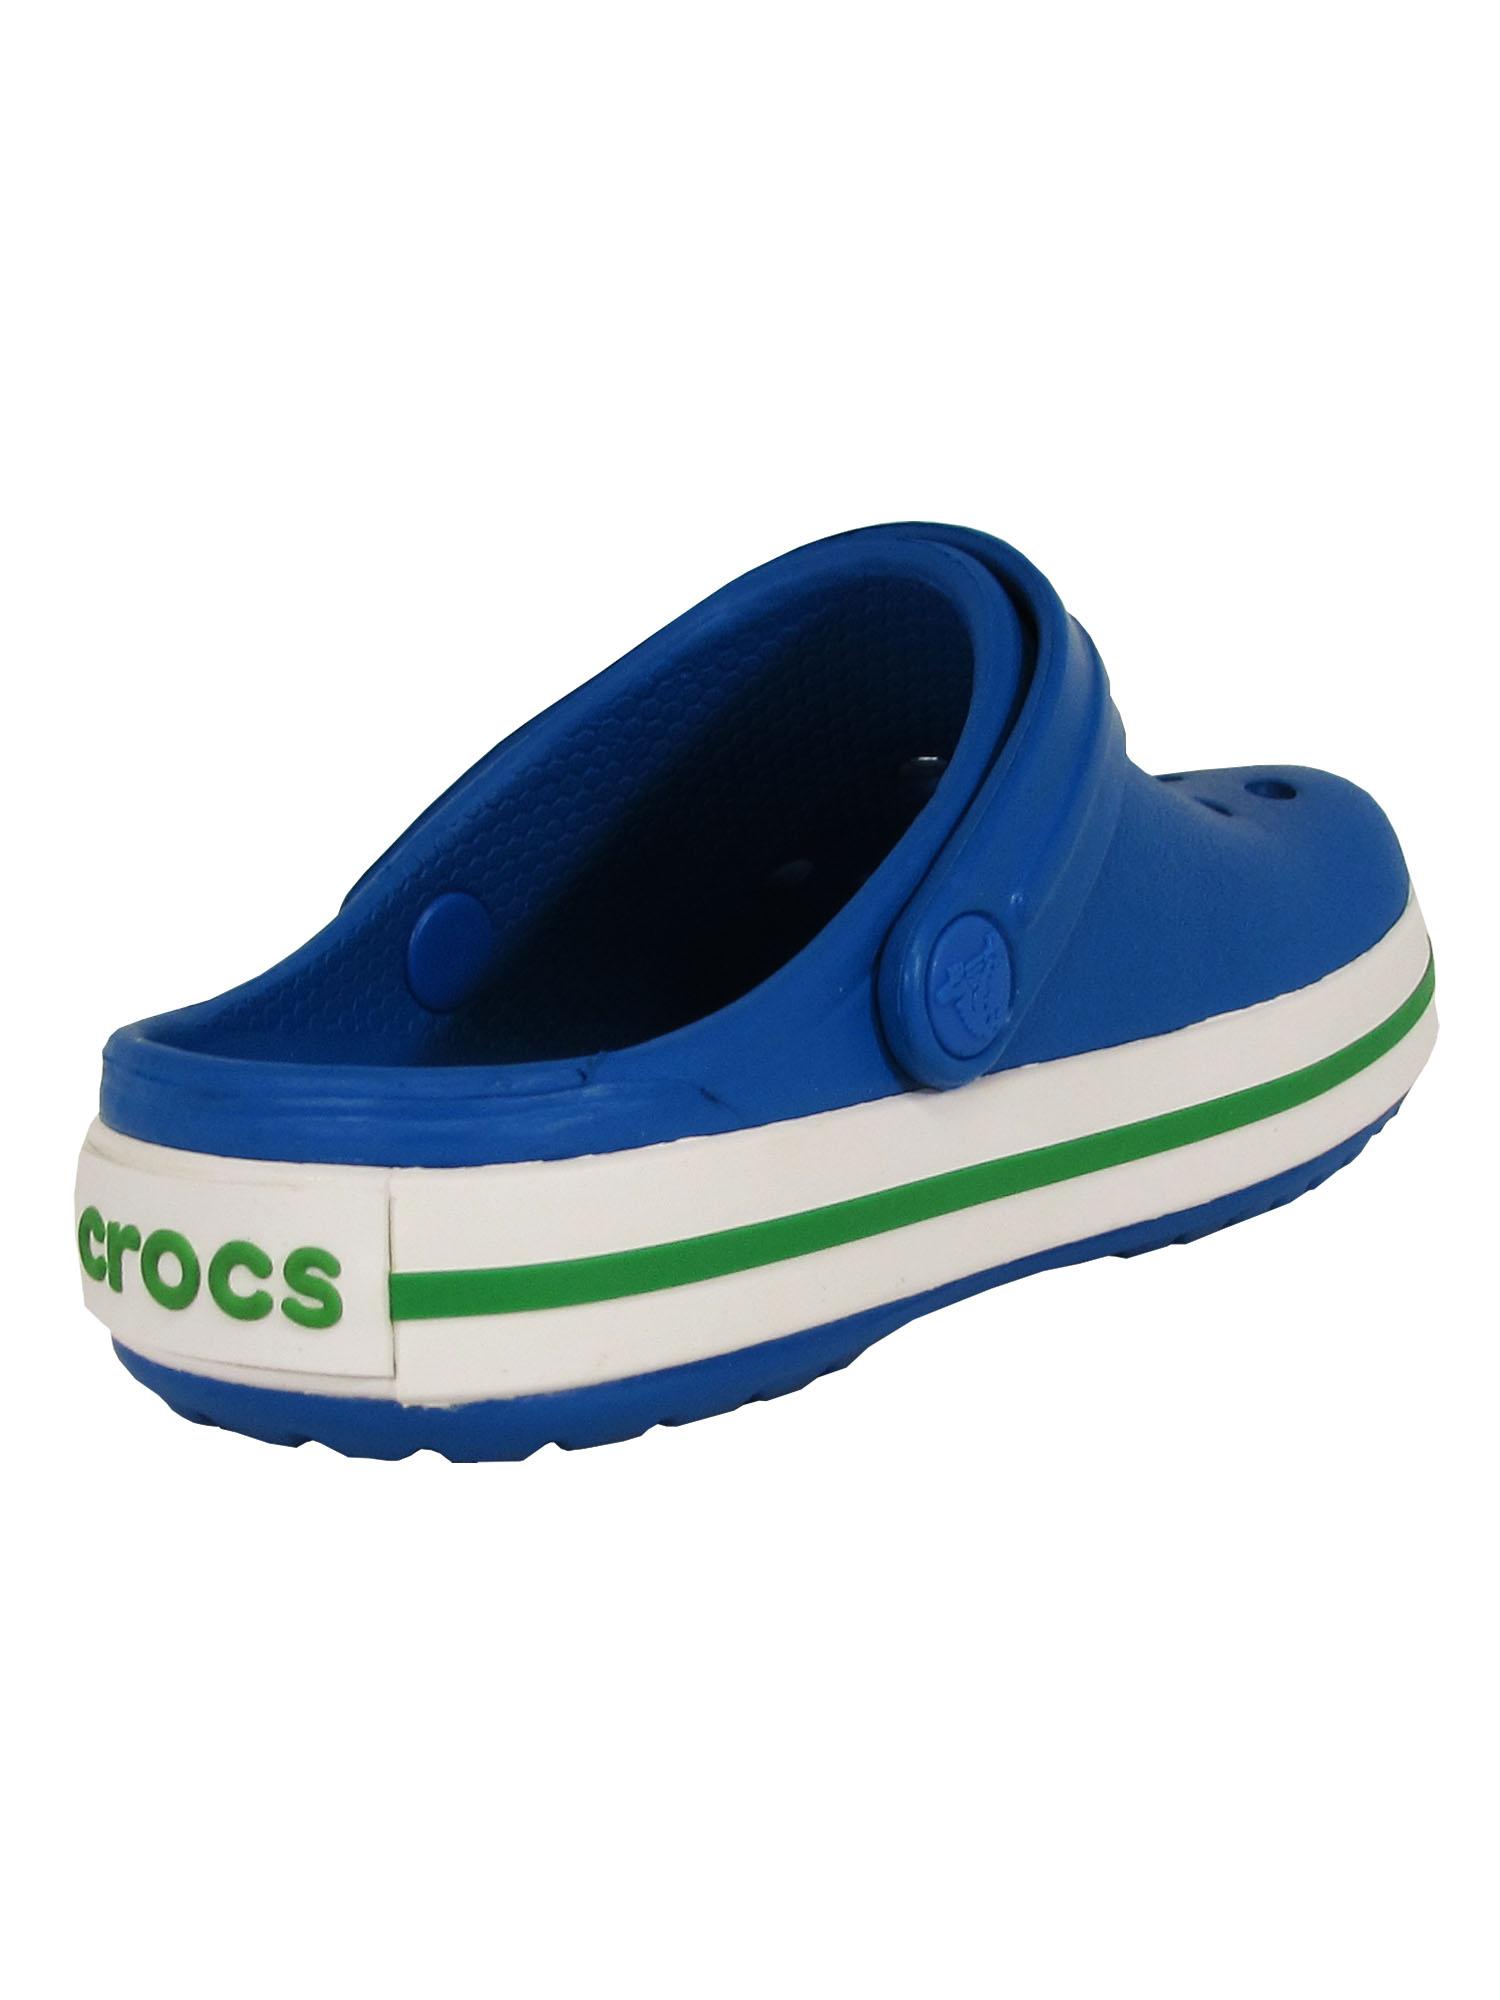 Crocs-Crocband-Kids-Slip-On-Clog-Shoes thumbnail 16